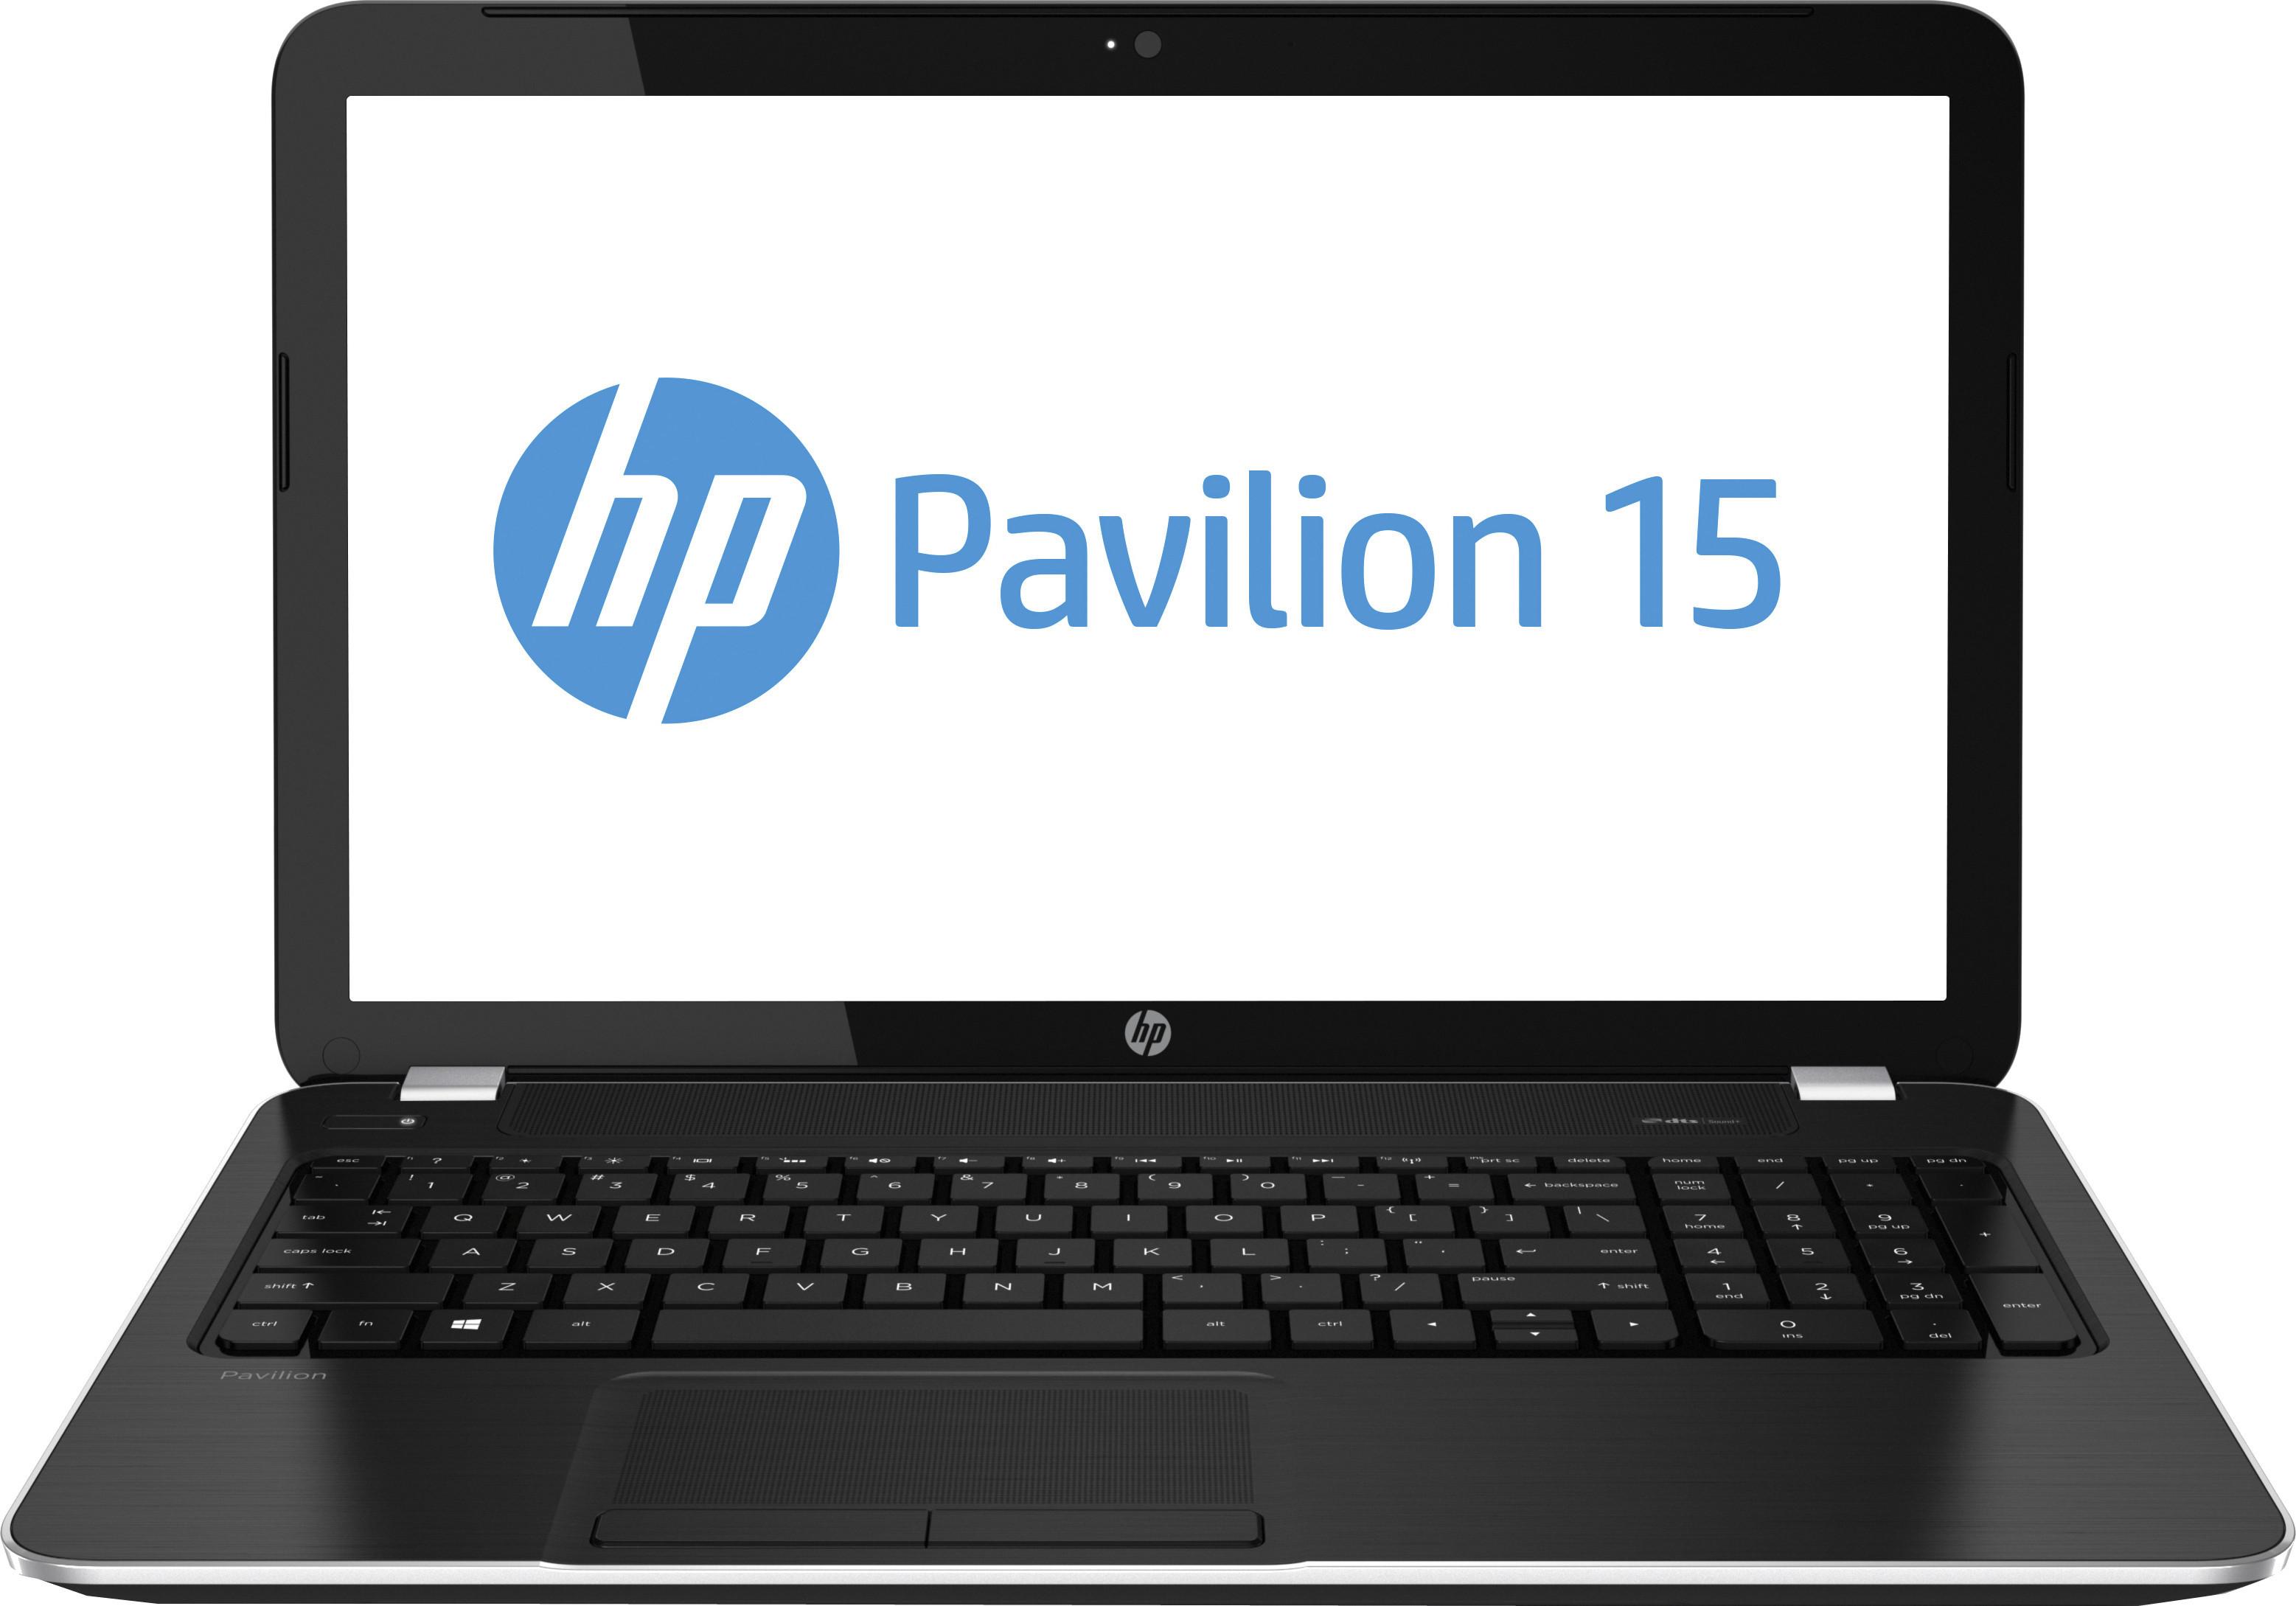 Laptops Between 35000 To 40000 Hp Pavilion Notebook Original Imadzcksneumun